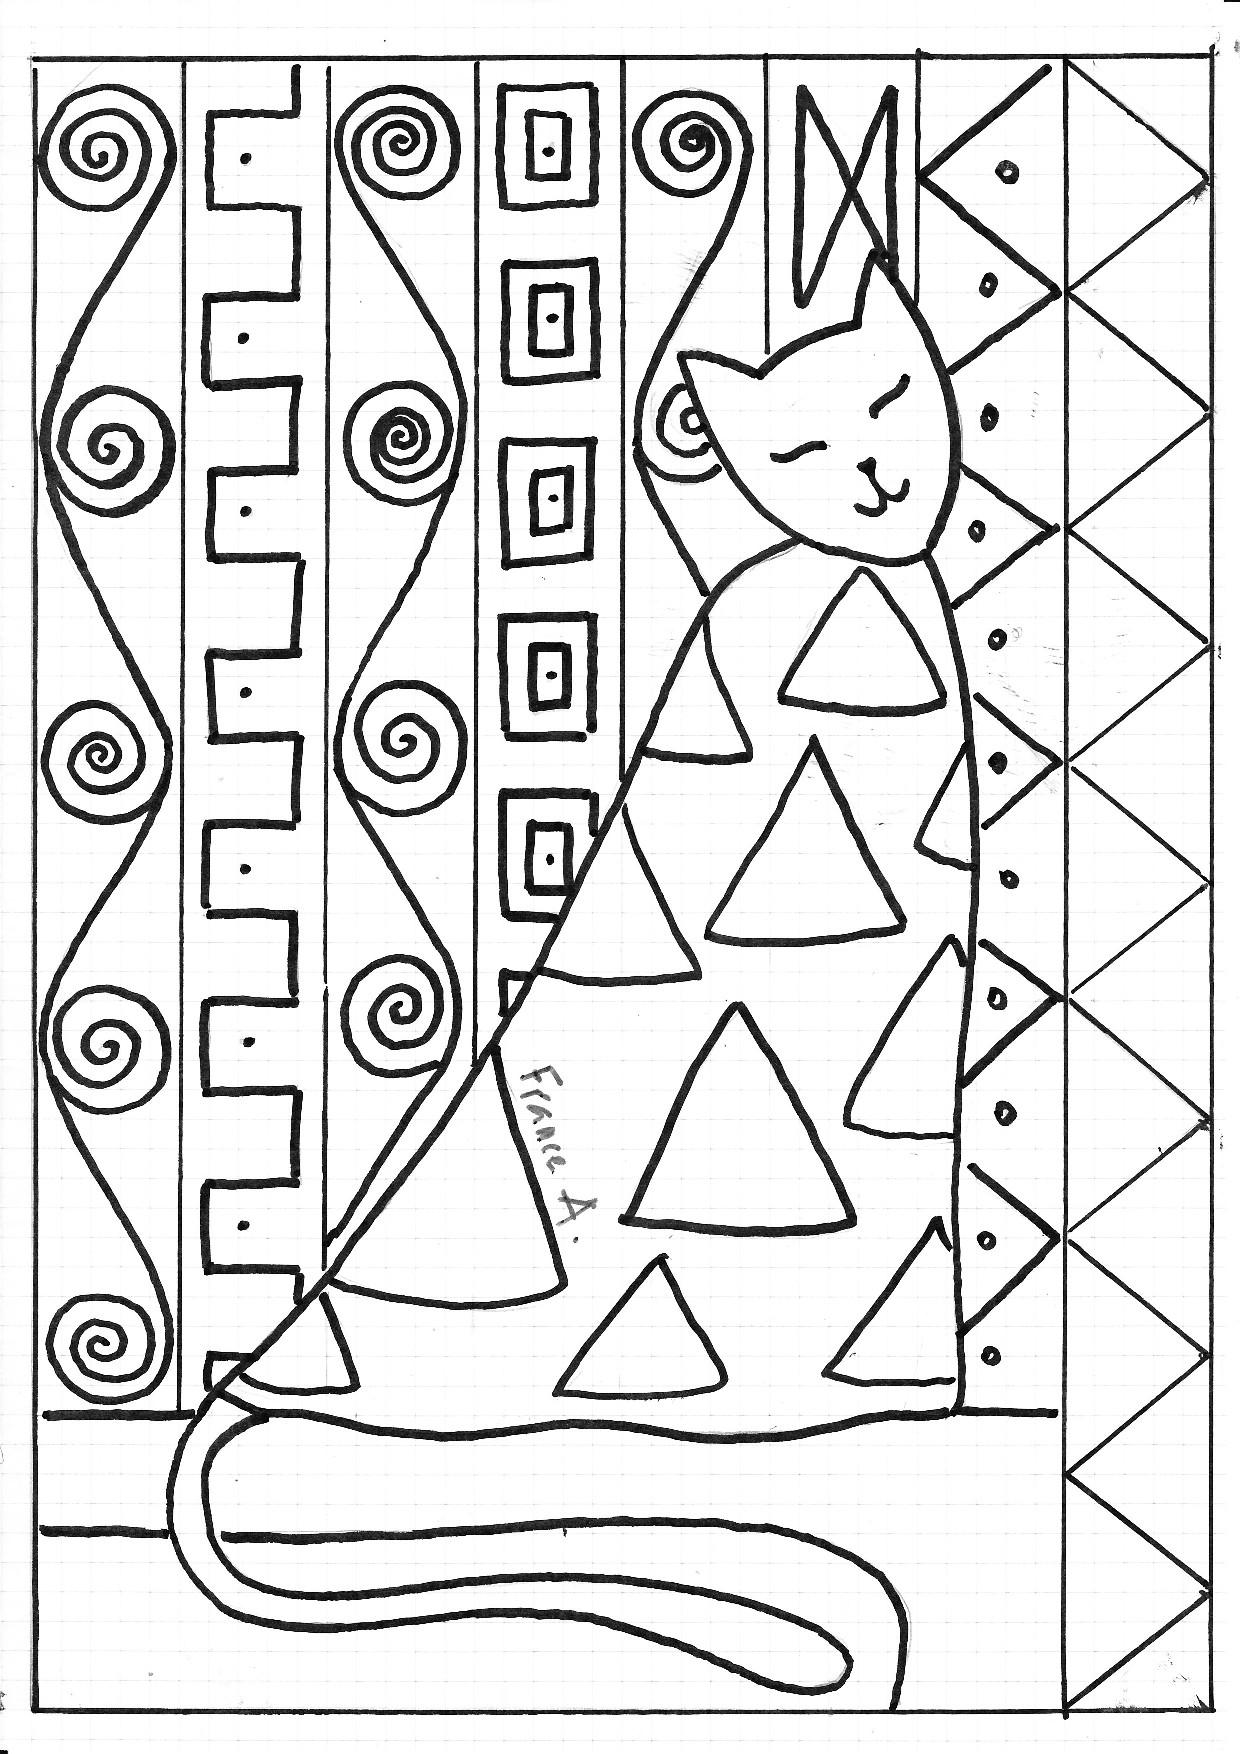 chats la mani re de peintres